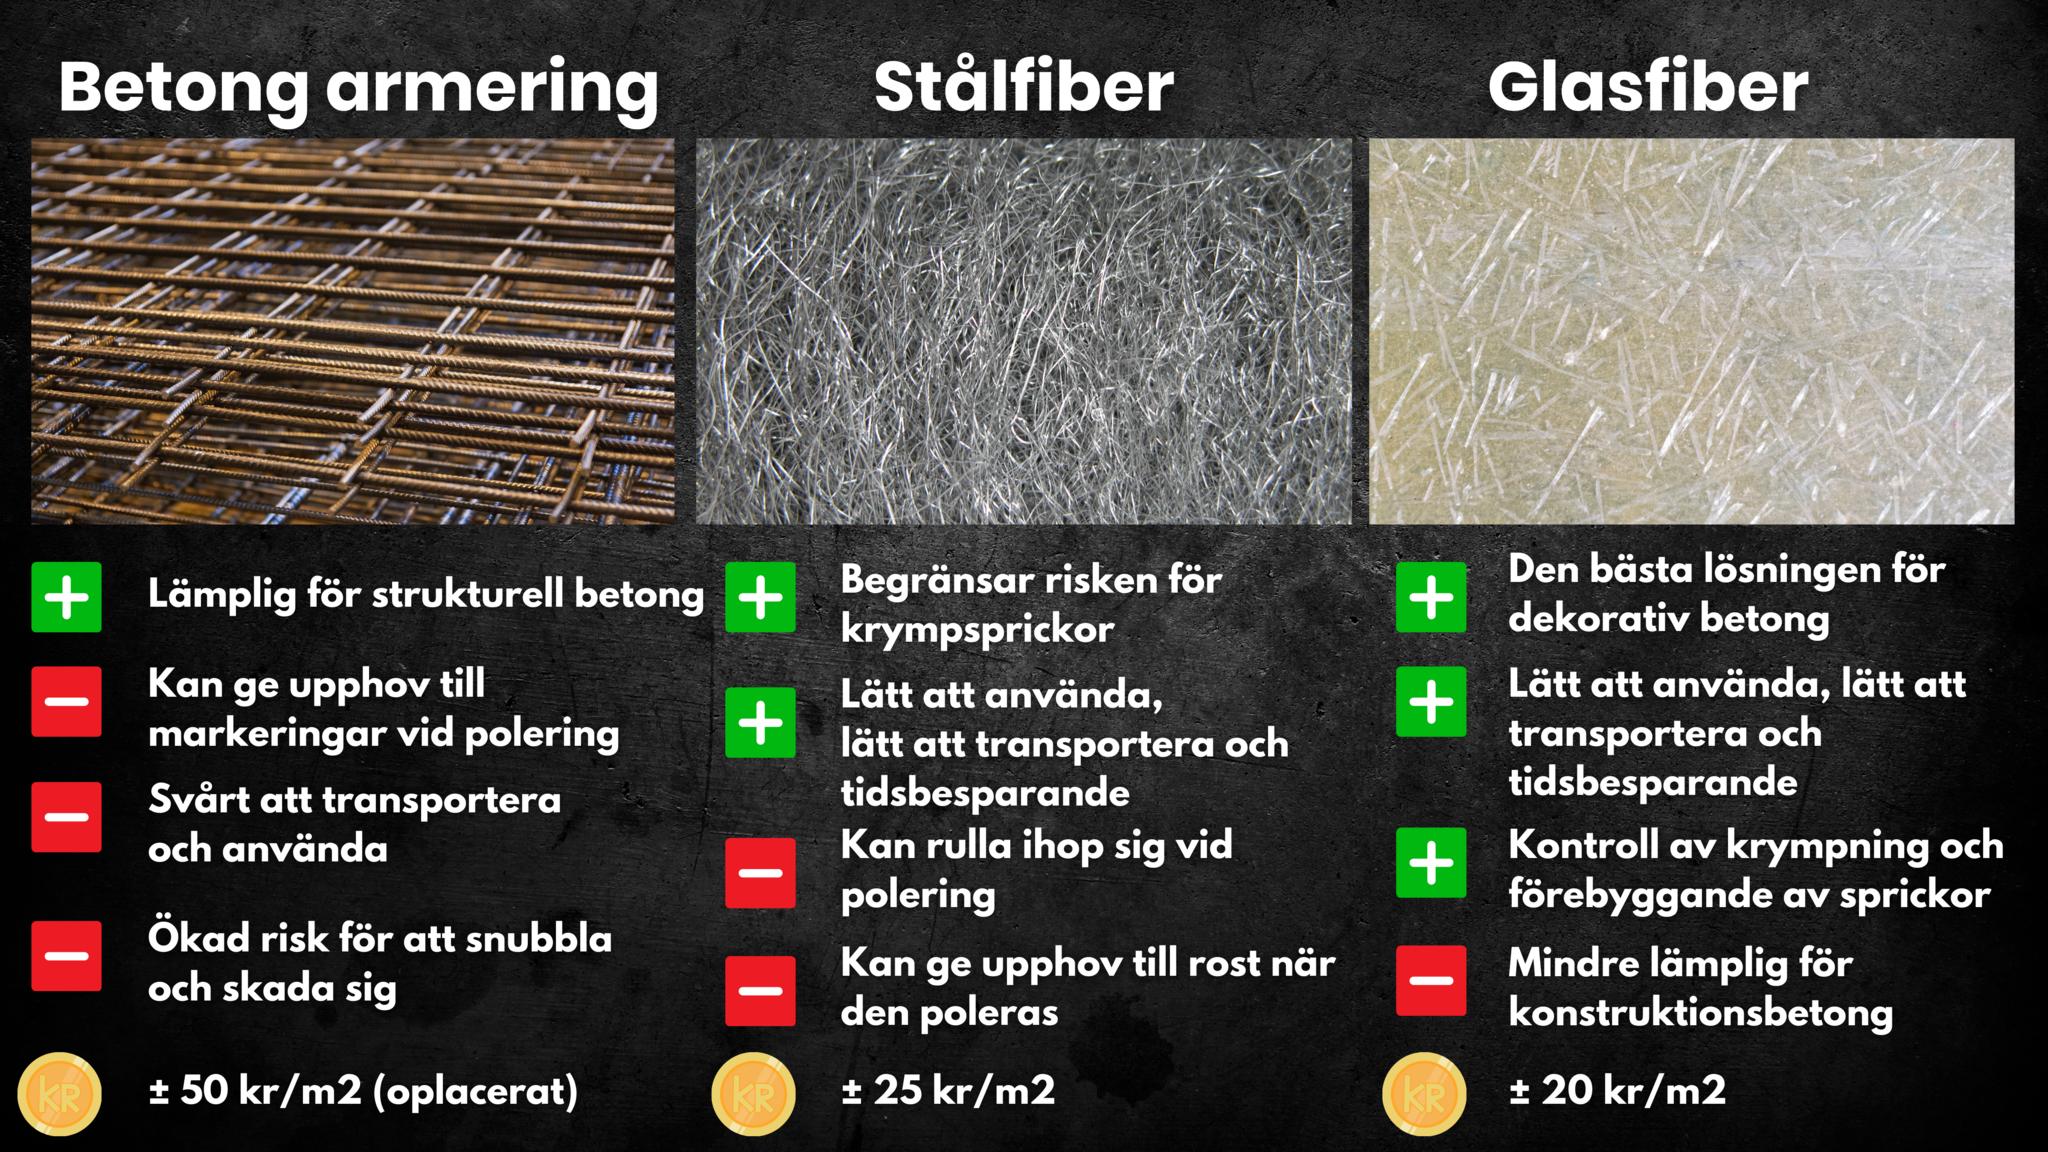 Betong armering v stålfiber v glasfiber